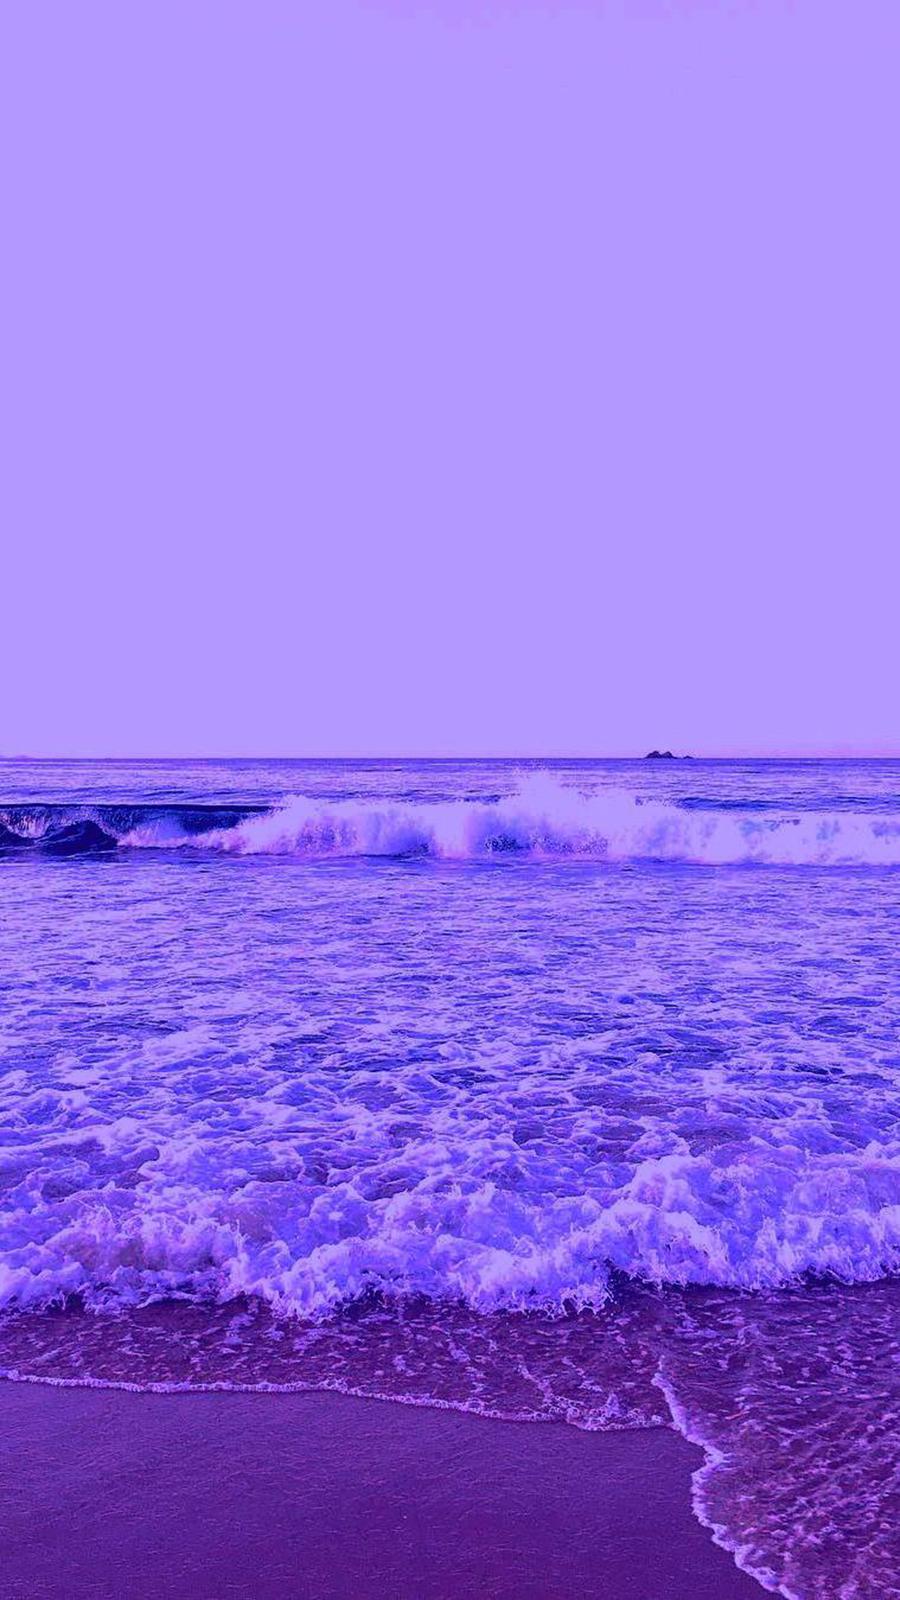 Purple Ocean, Sea, Beach Wallpapers Free Download